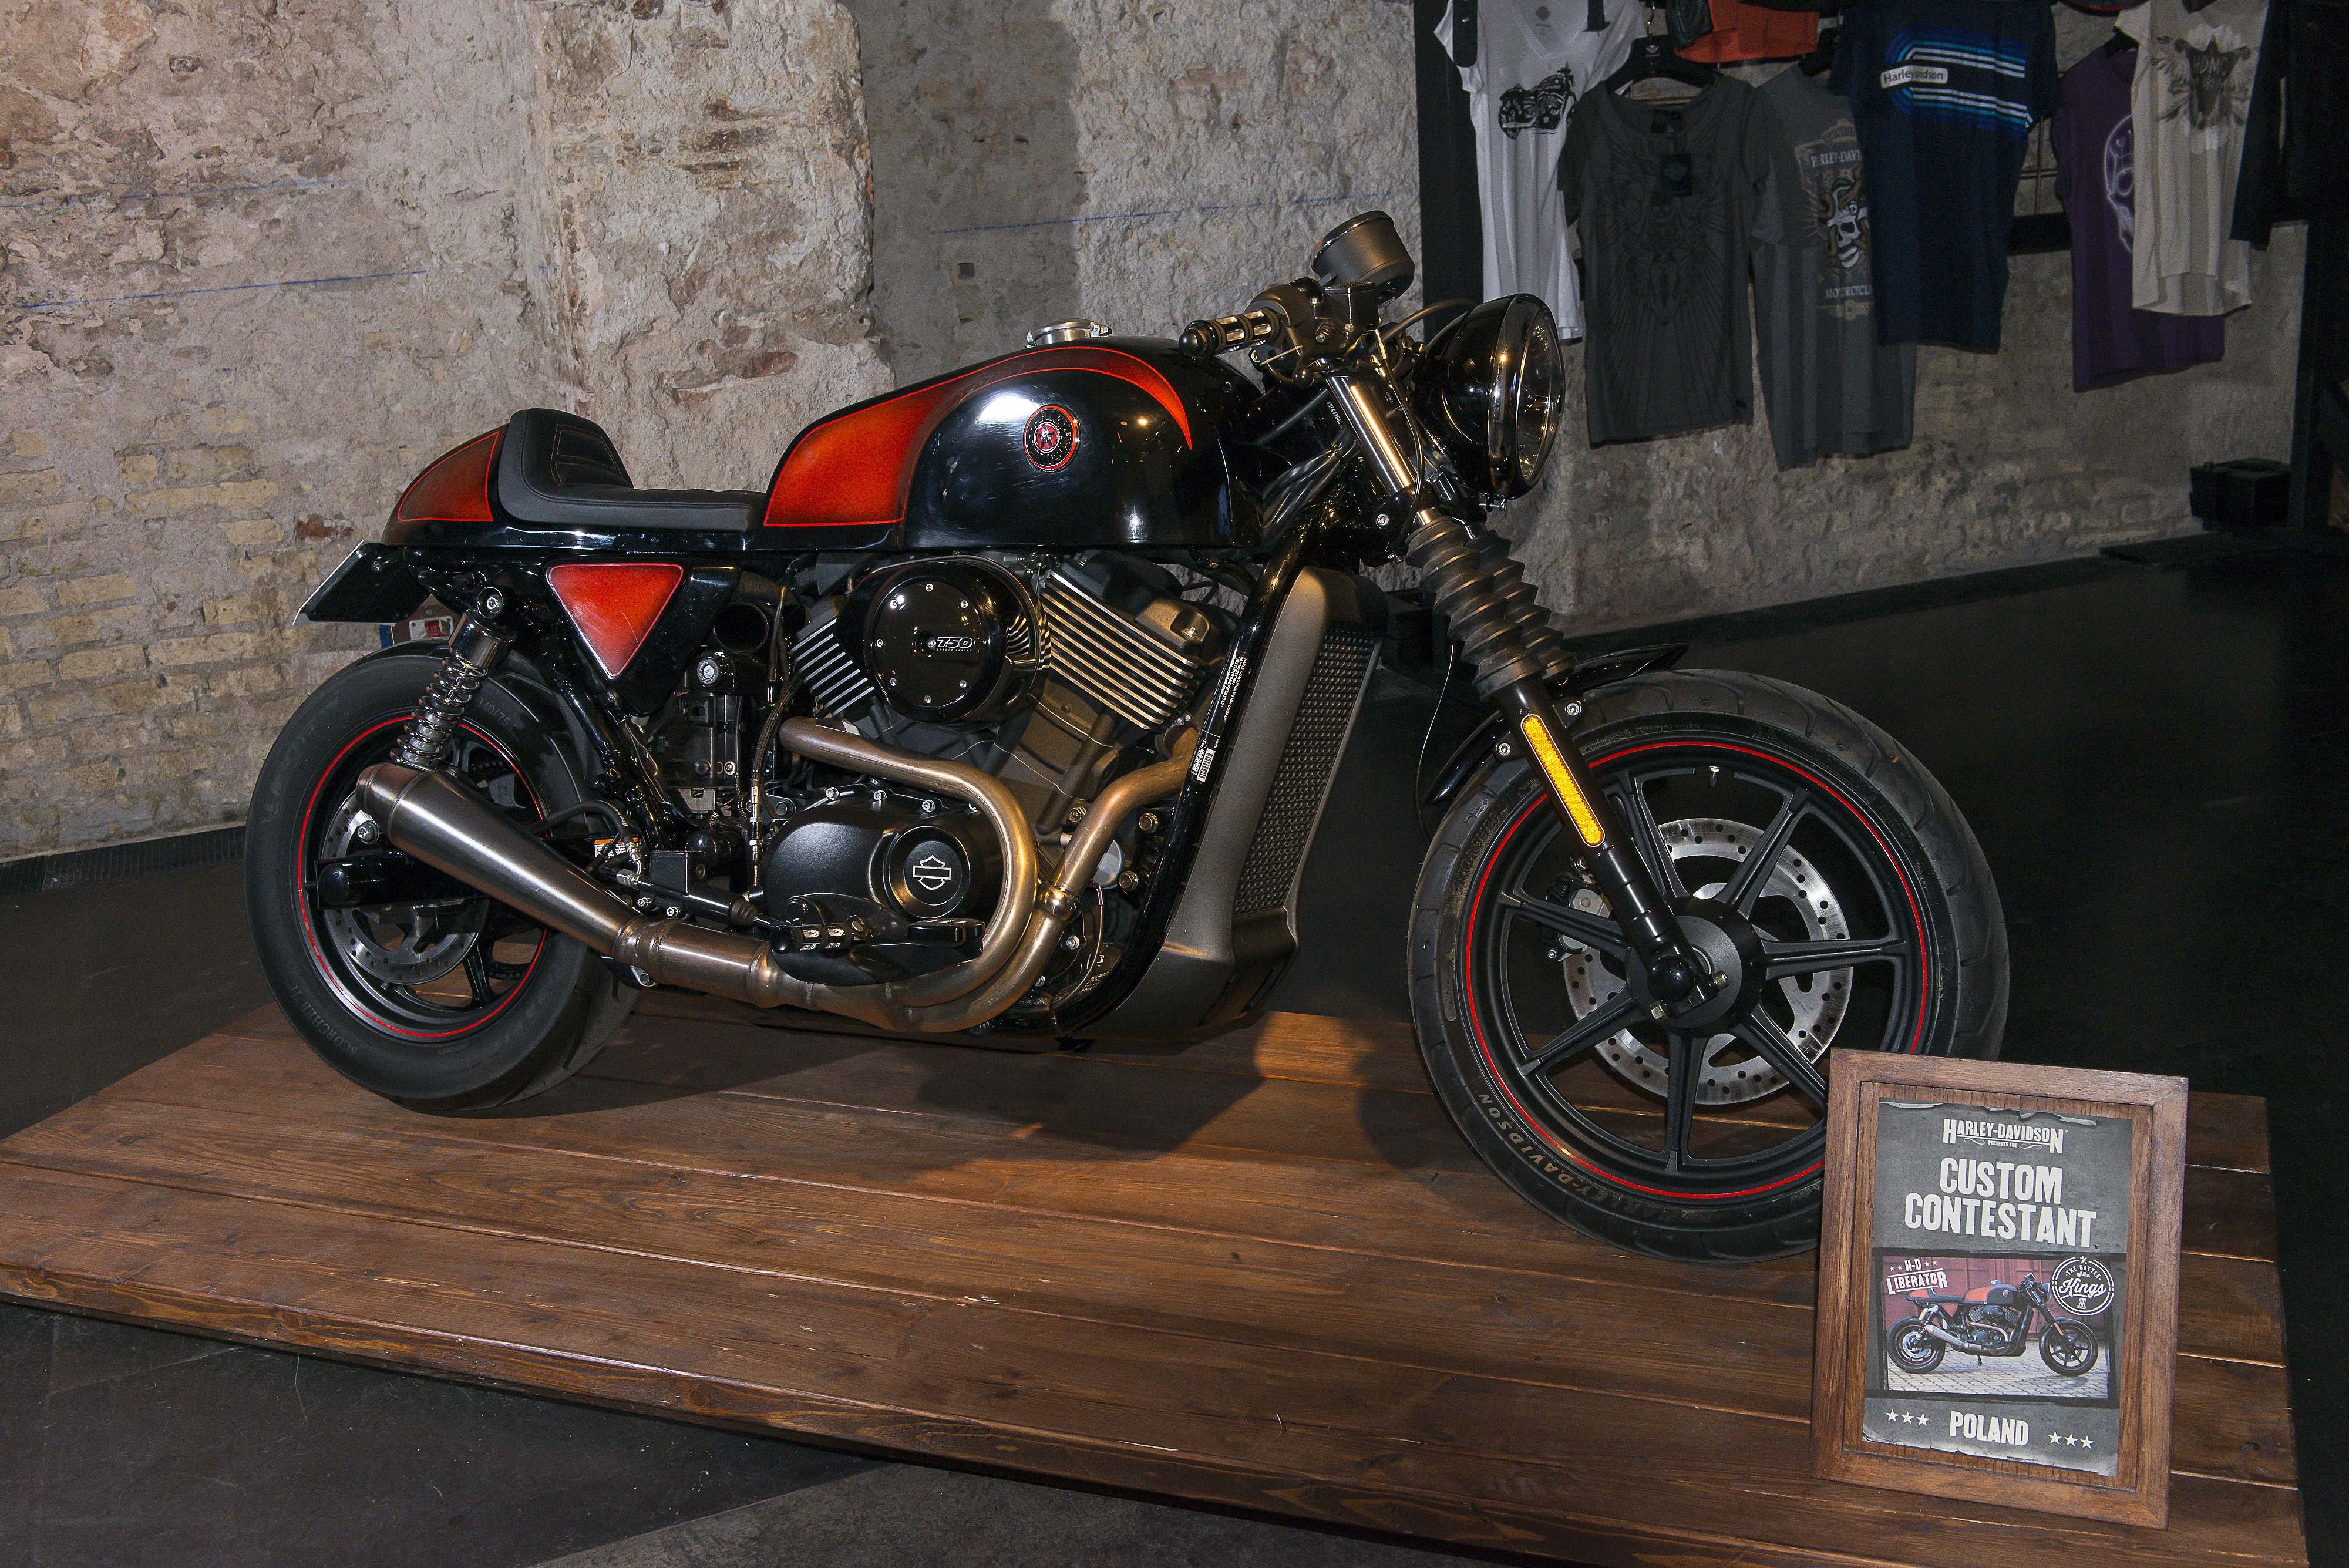 Harley's Street 750 scrambler custom